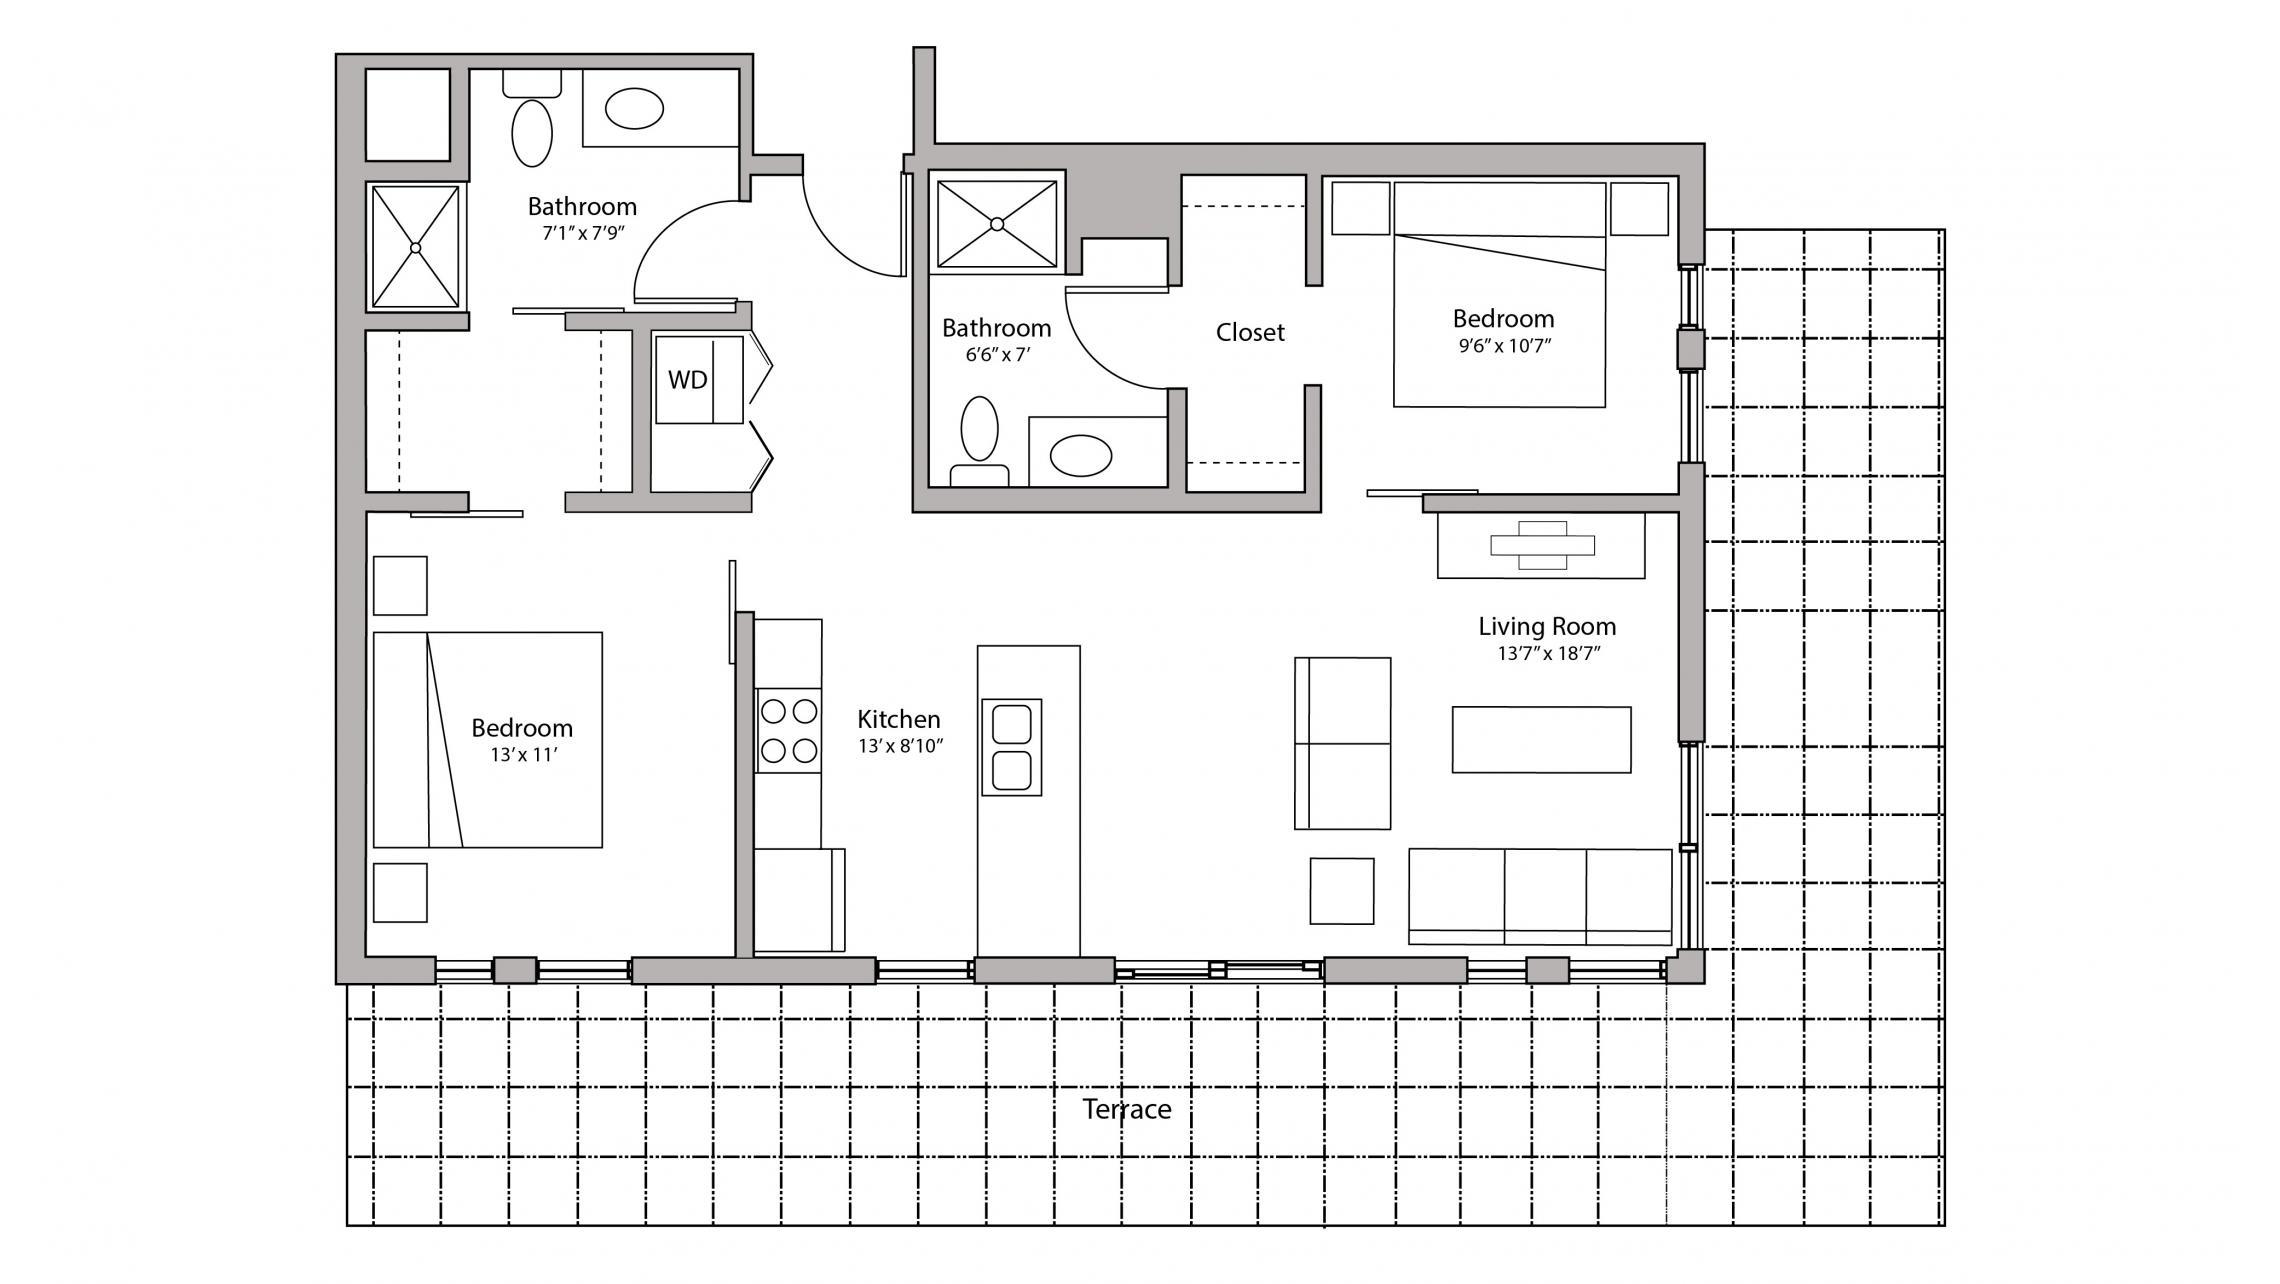 ULI Capitol Hill 501 - Two Bedroom, Two Bathroom Floorplan